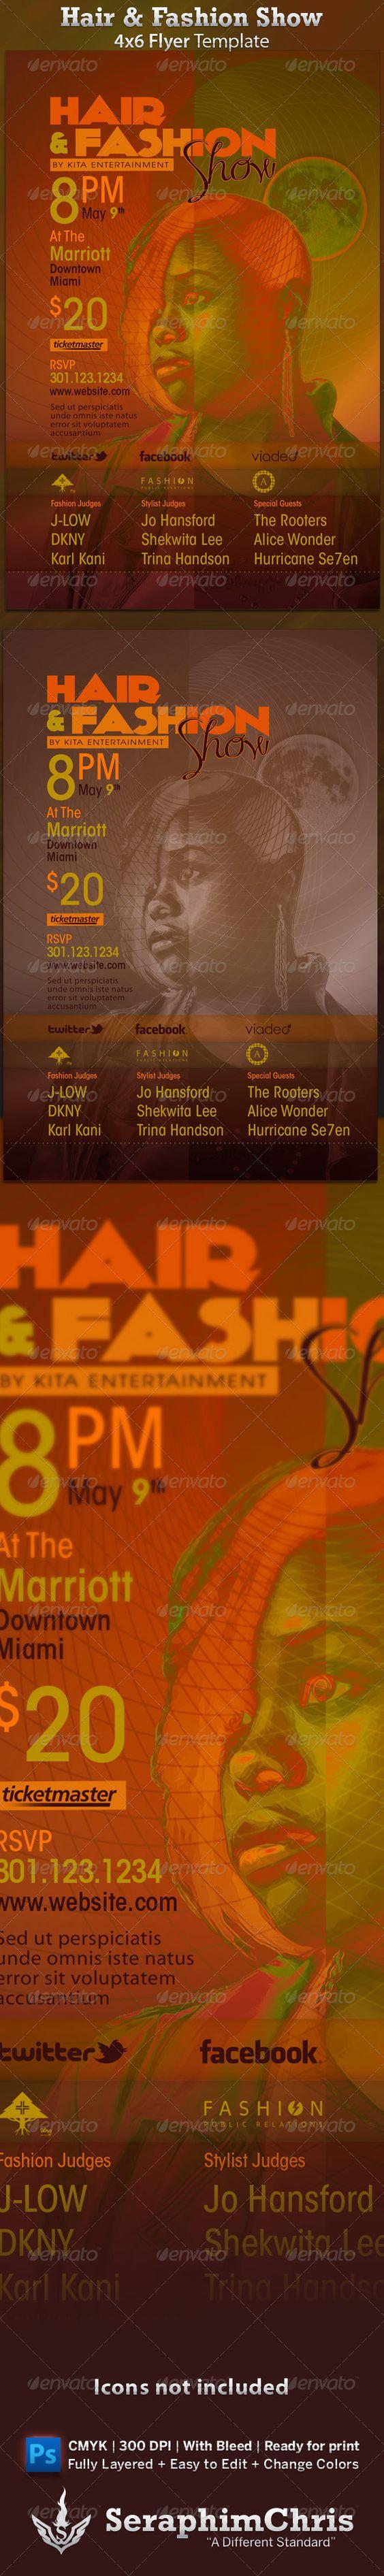 Hair & Fashion Show Flyer Template $6.00